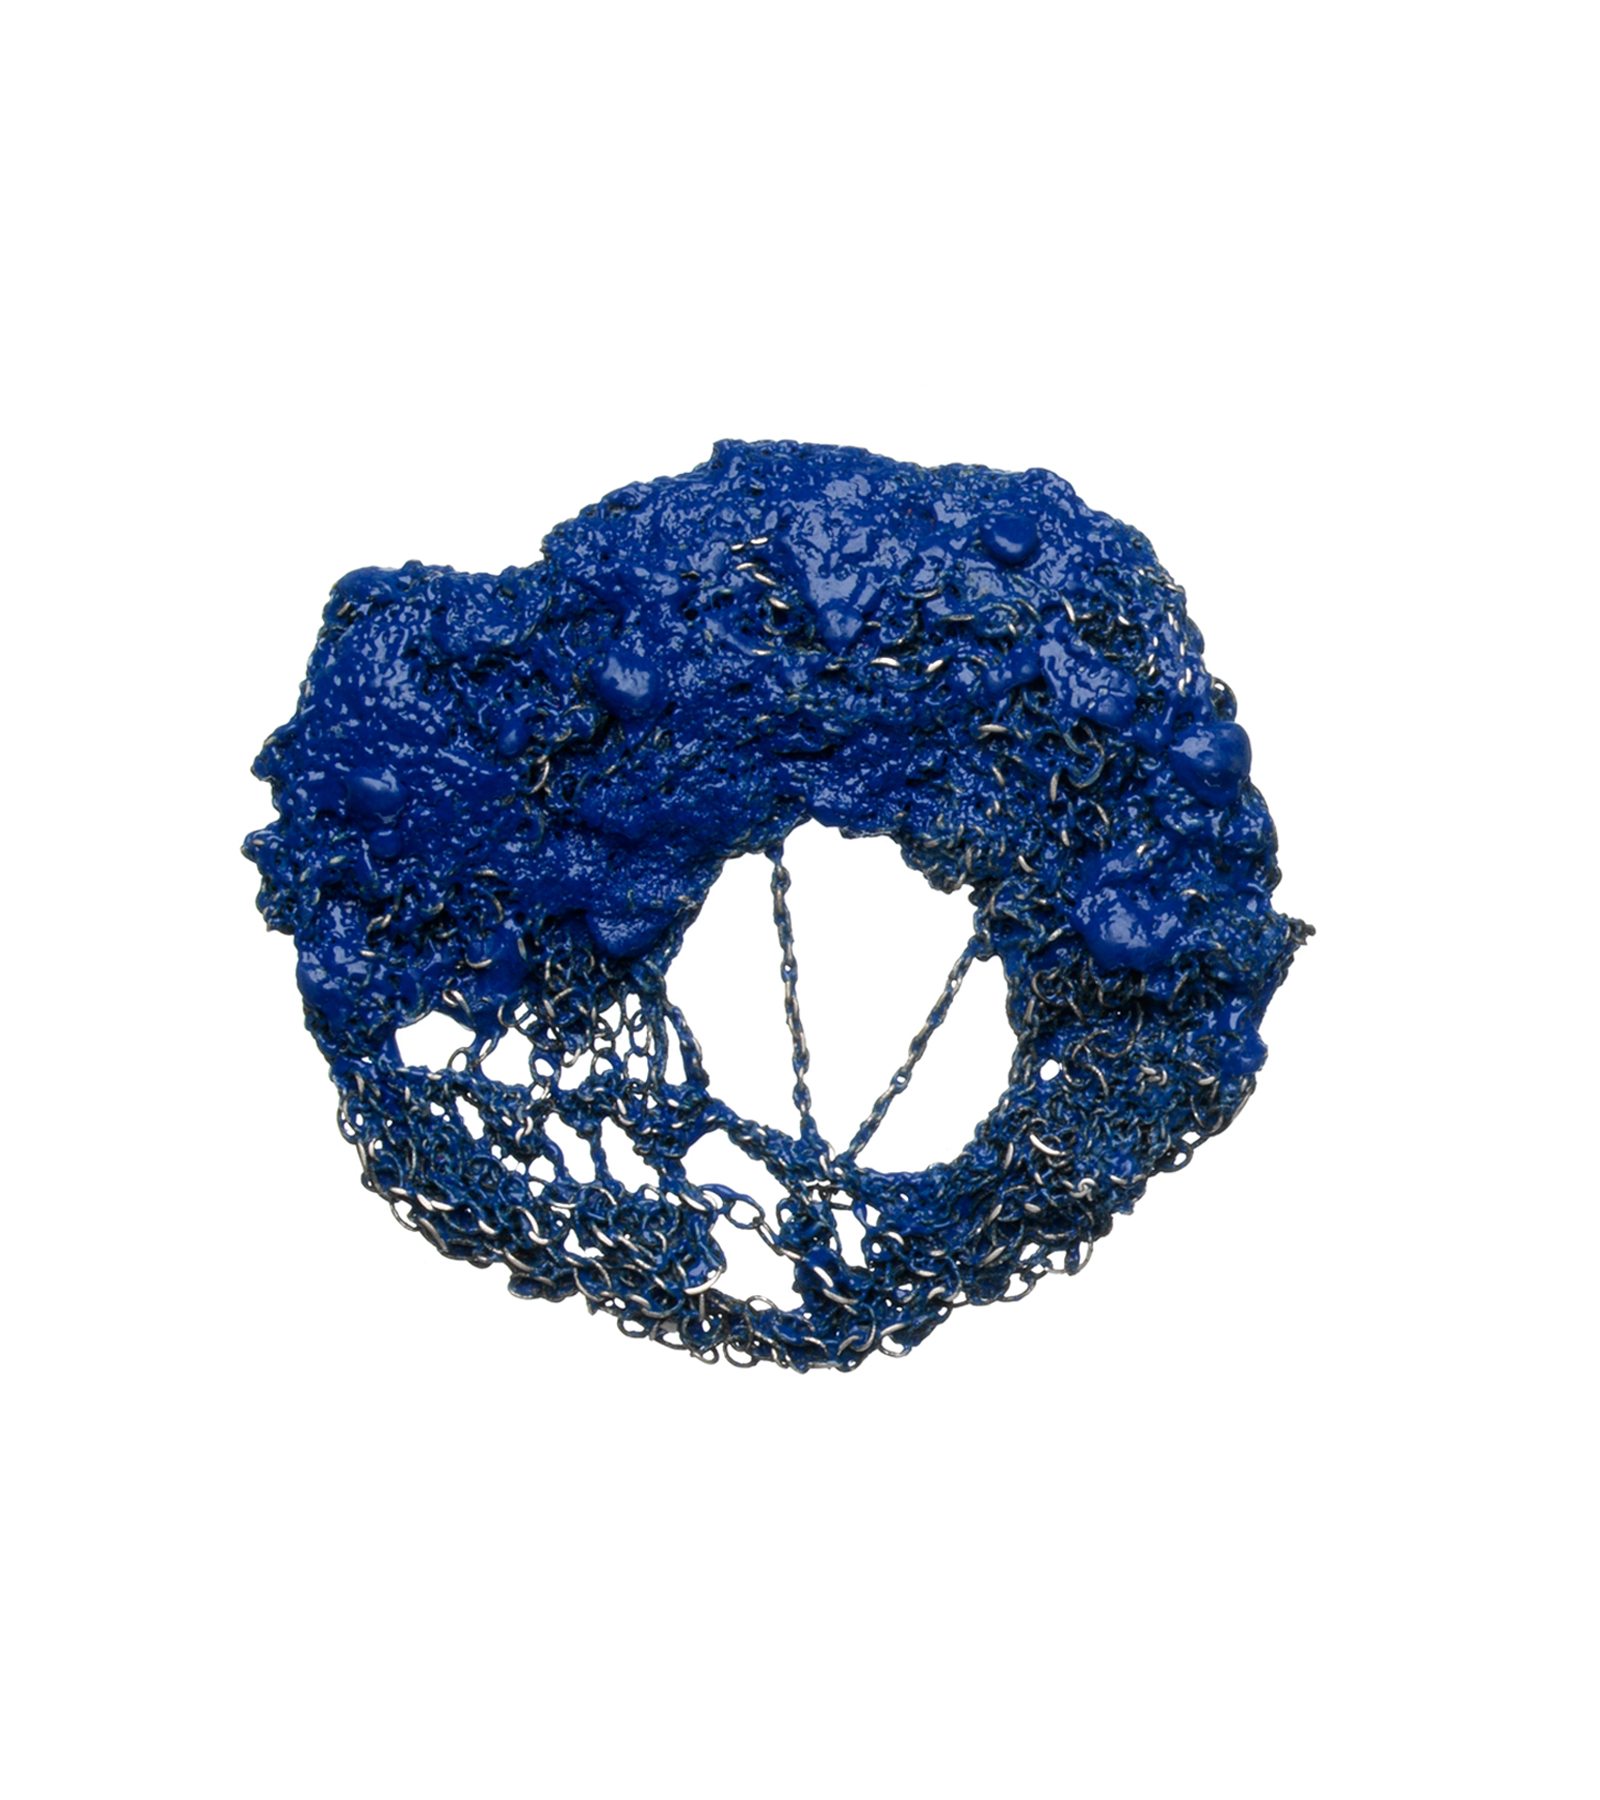 Royal Blue Oval Silver Brooch, 2012